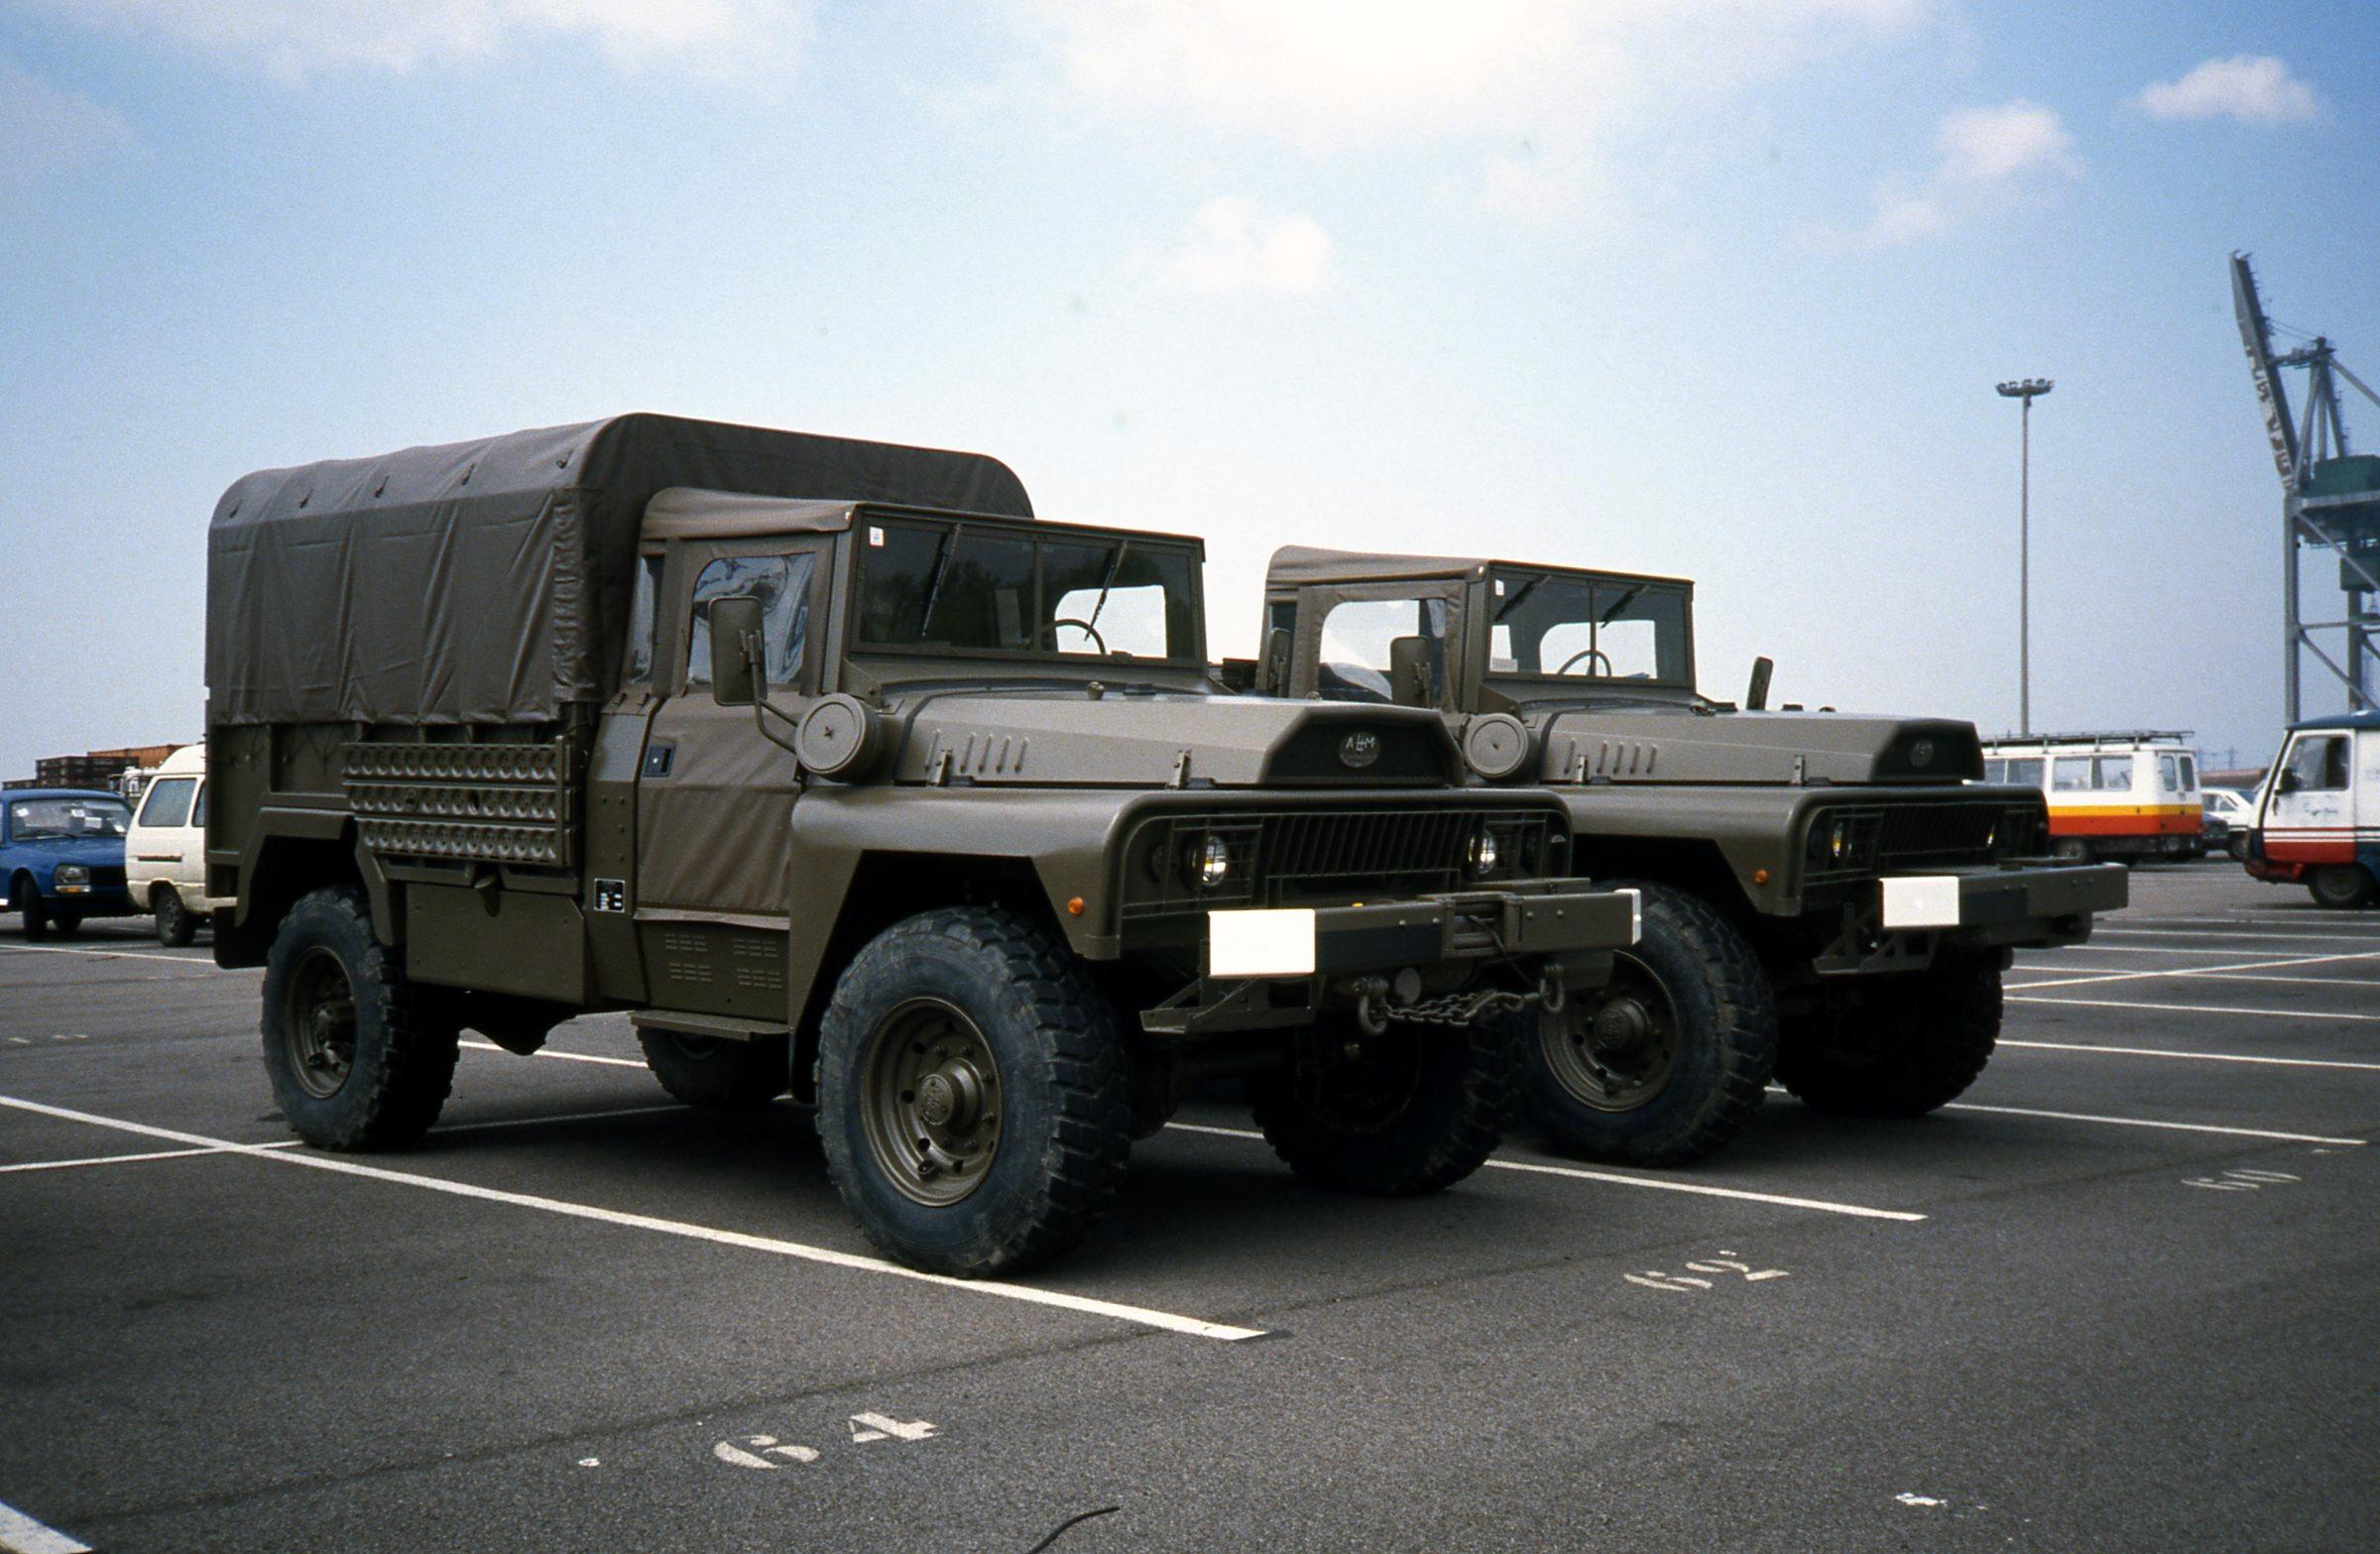 Photos - Logistique et Camions / Logistics and Trucks - Page 6 34525719420_5b741b15b6_o